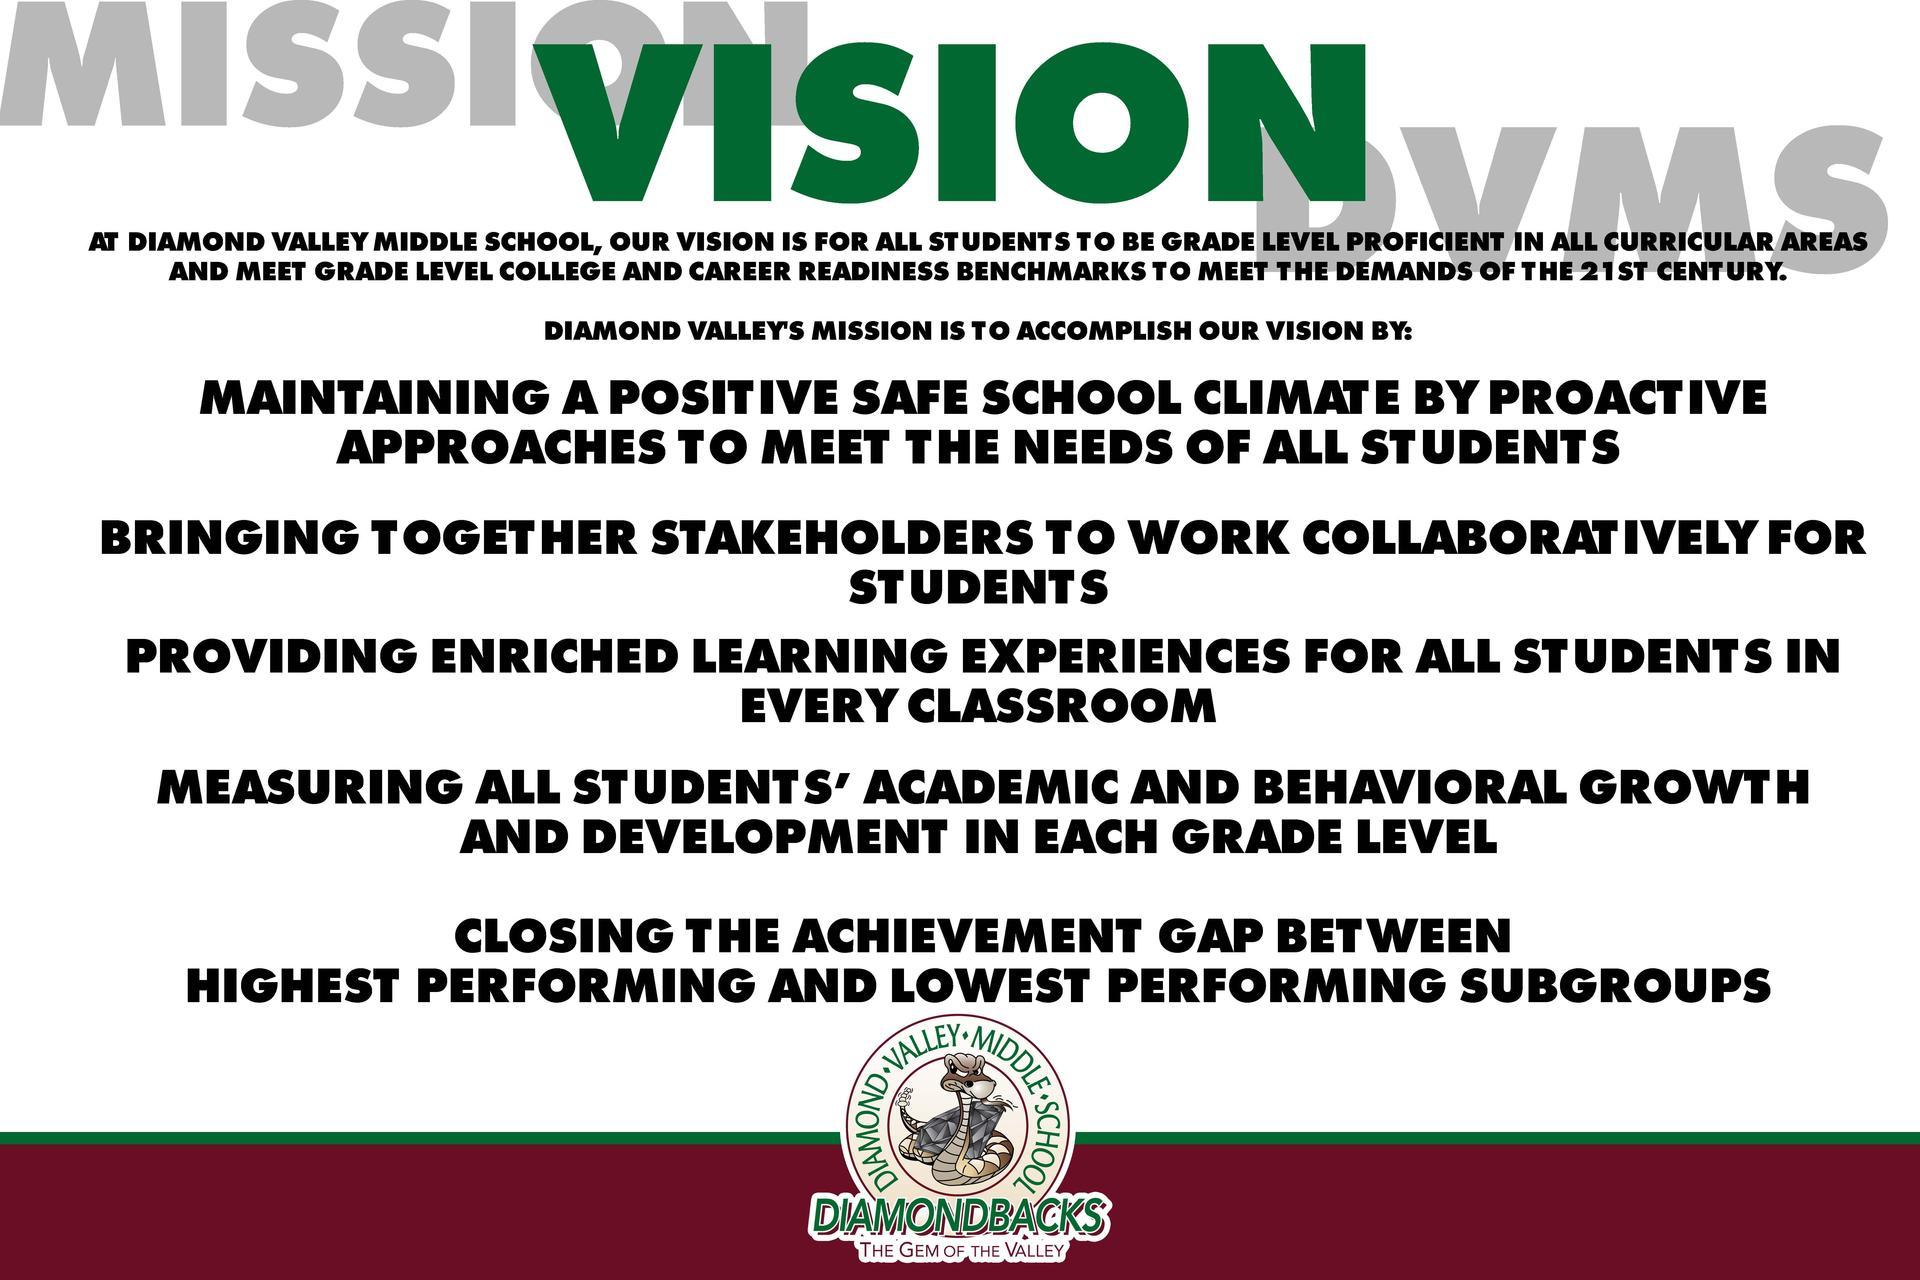 Diamond Valley's Mission Statement